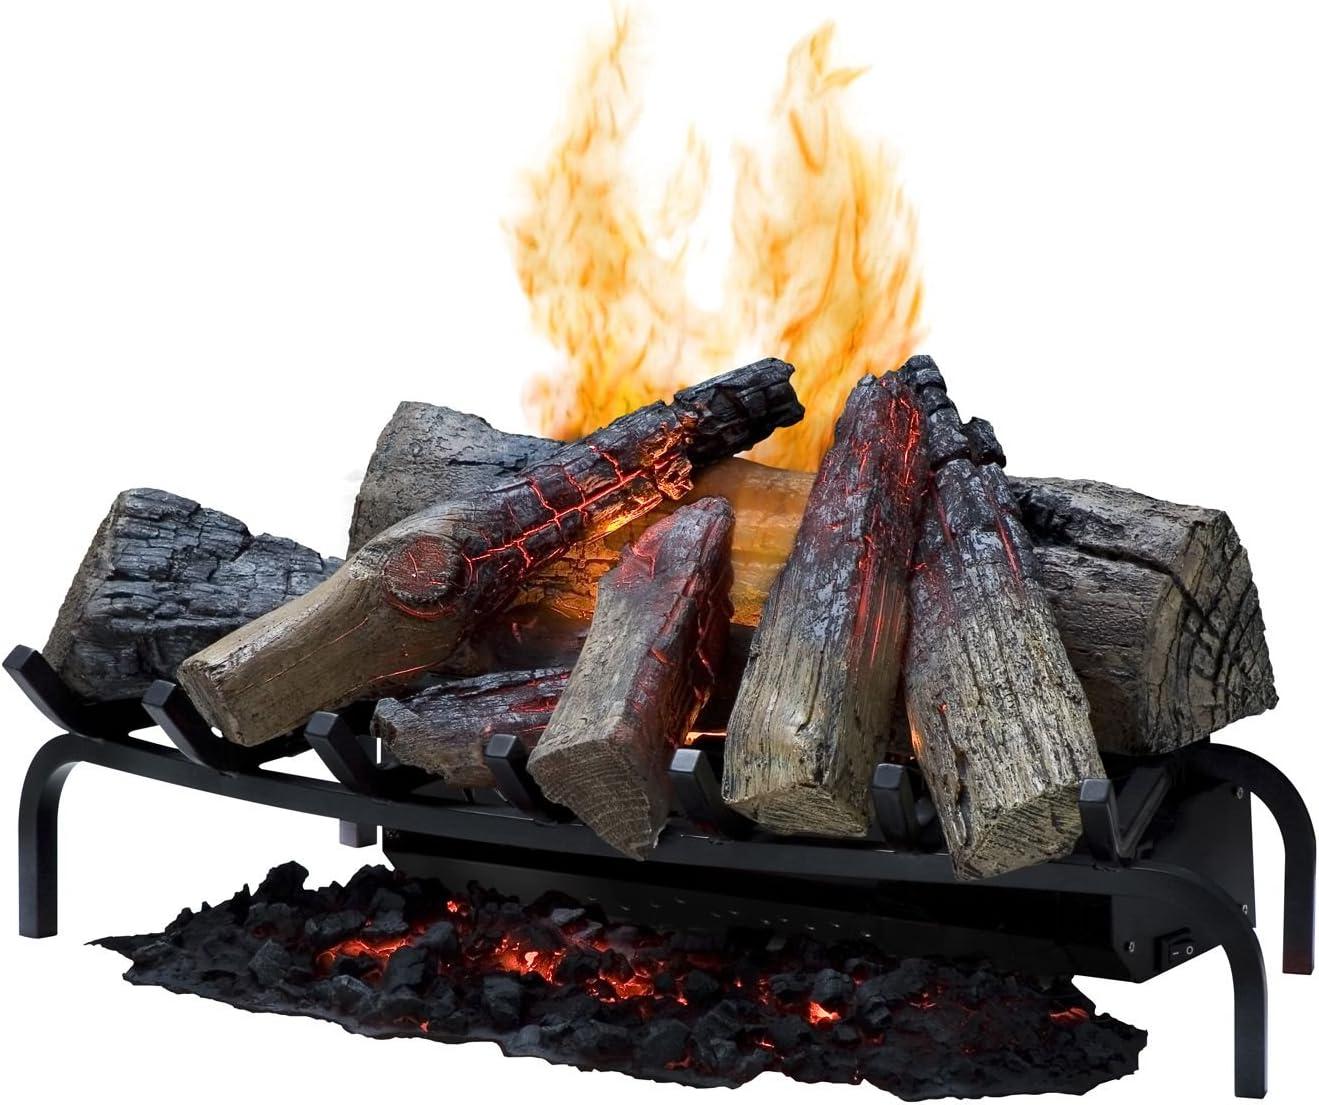 Opti Myst 3d Water Vapour Fireplace Insert Freestanding 68 Cm Wide Amazon De Küche Haushalt